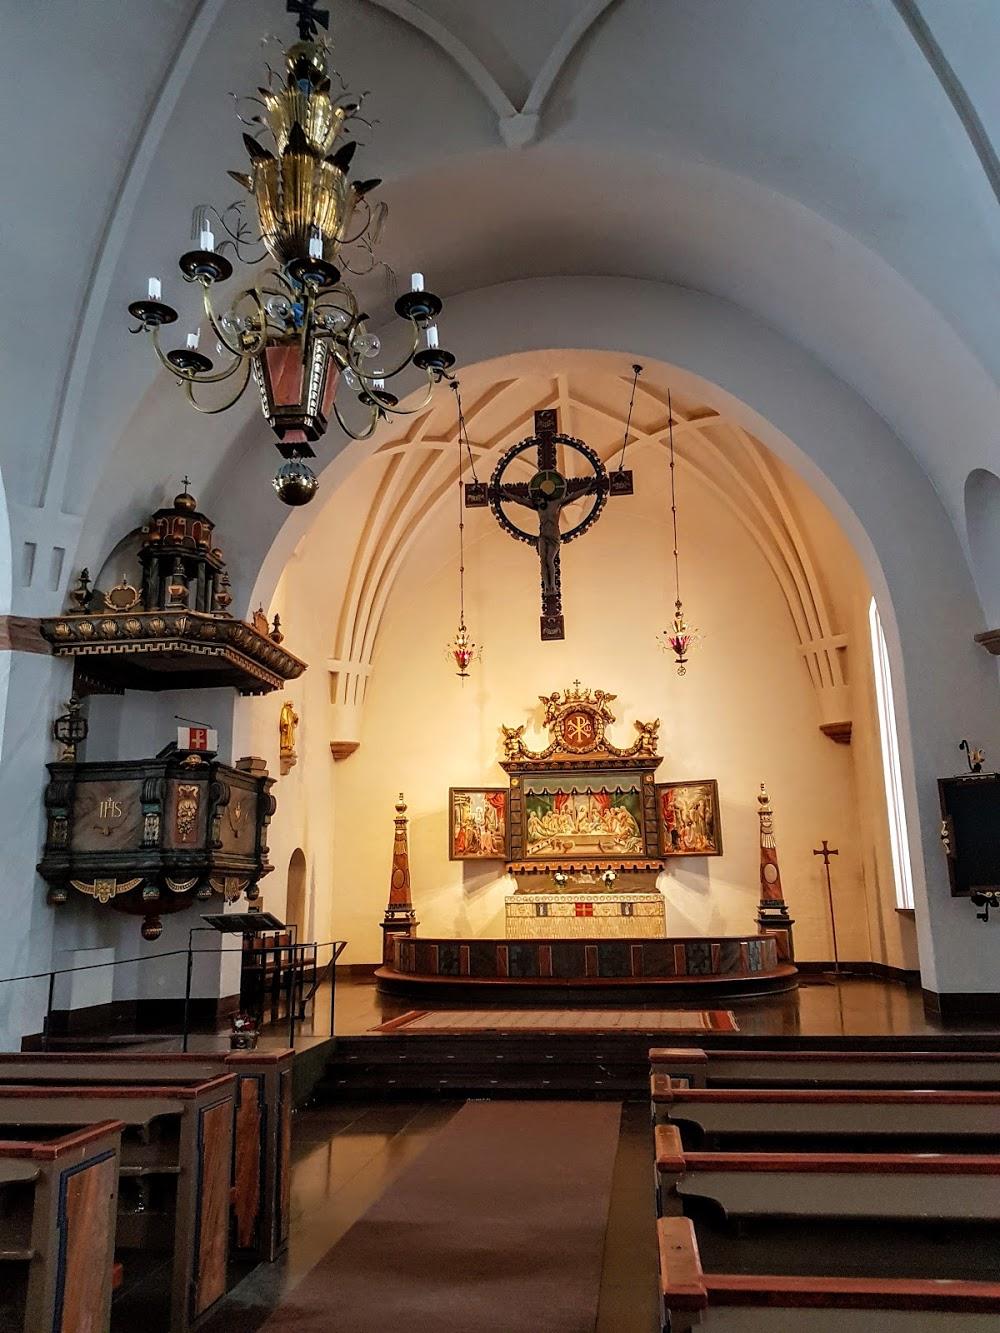 Alhems kyrkan